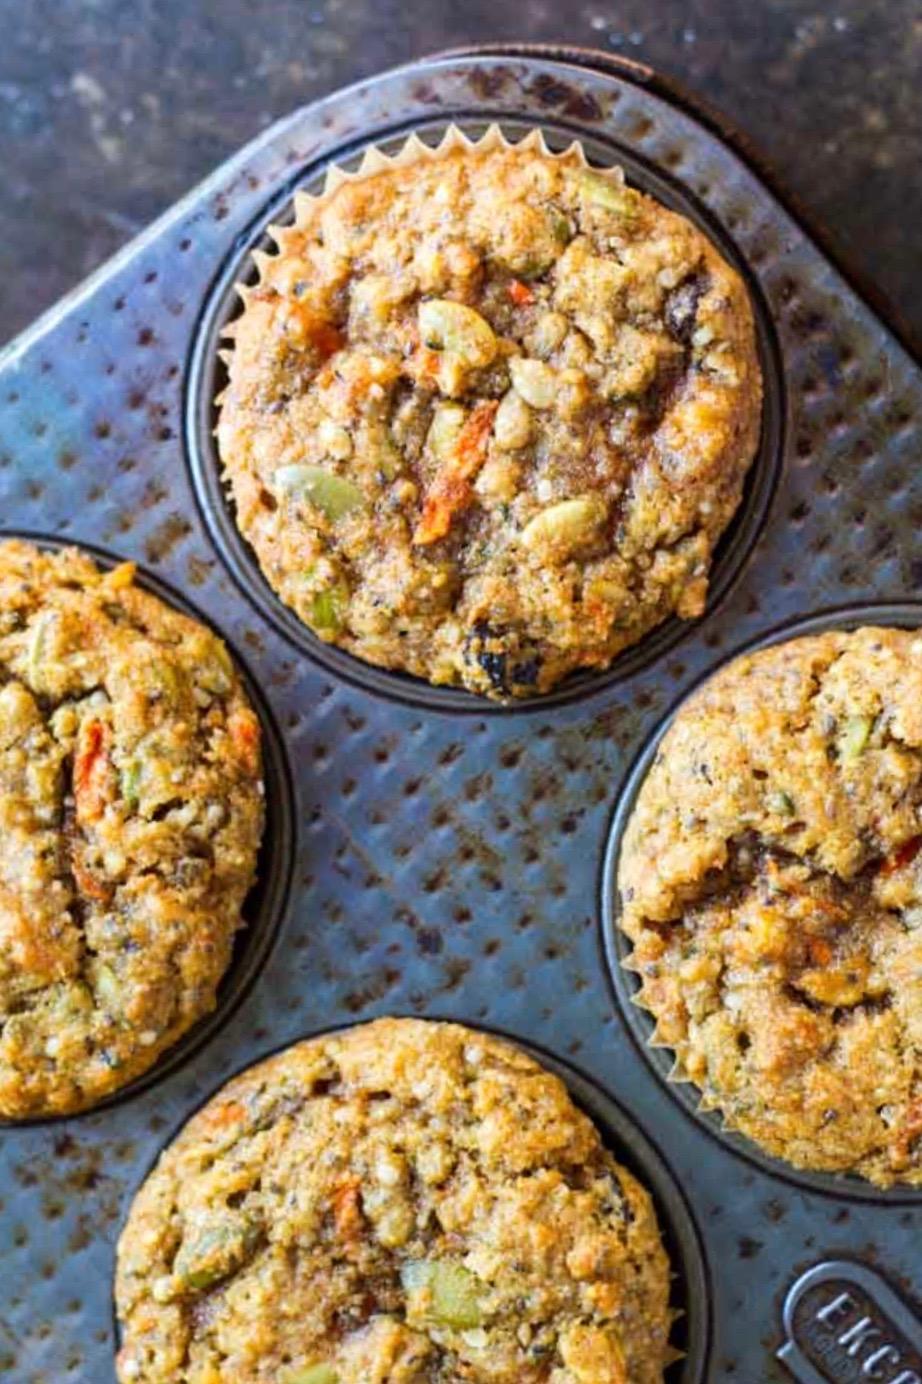 close up of muffin in a muffin tin